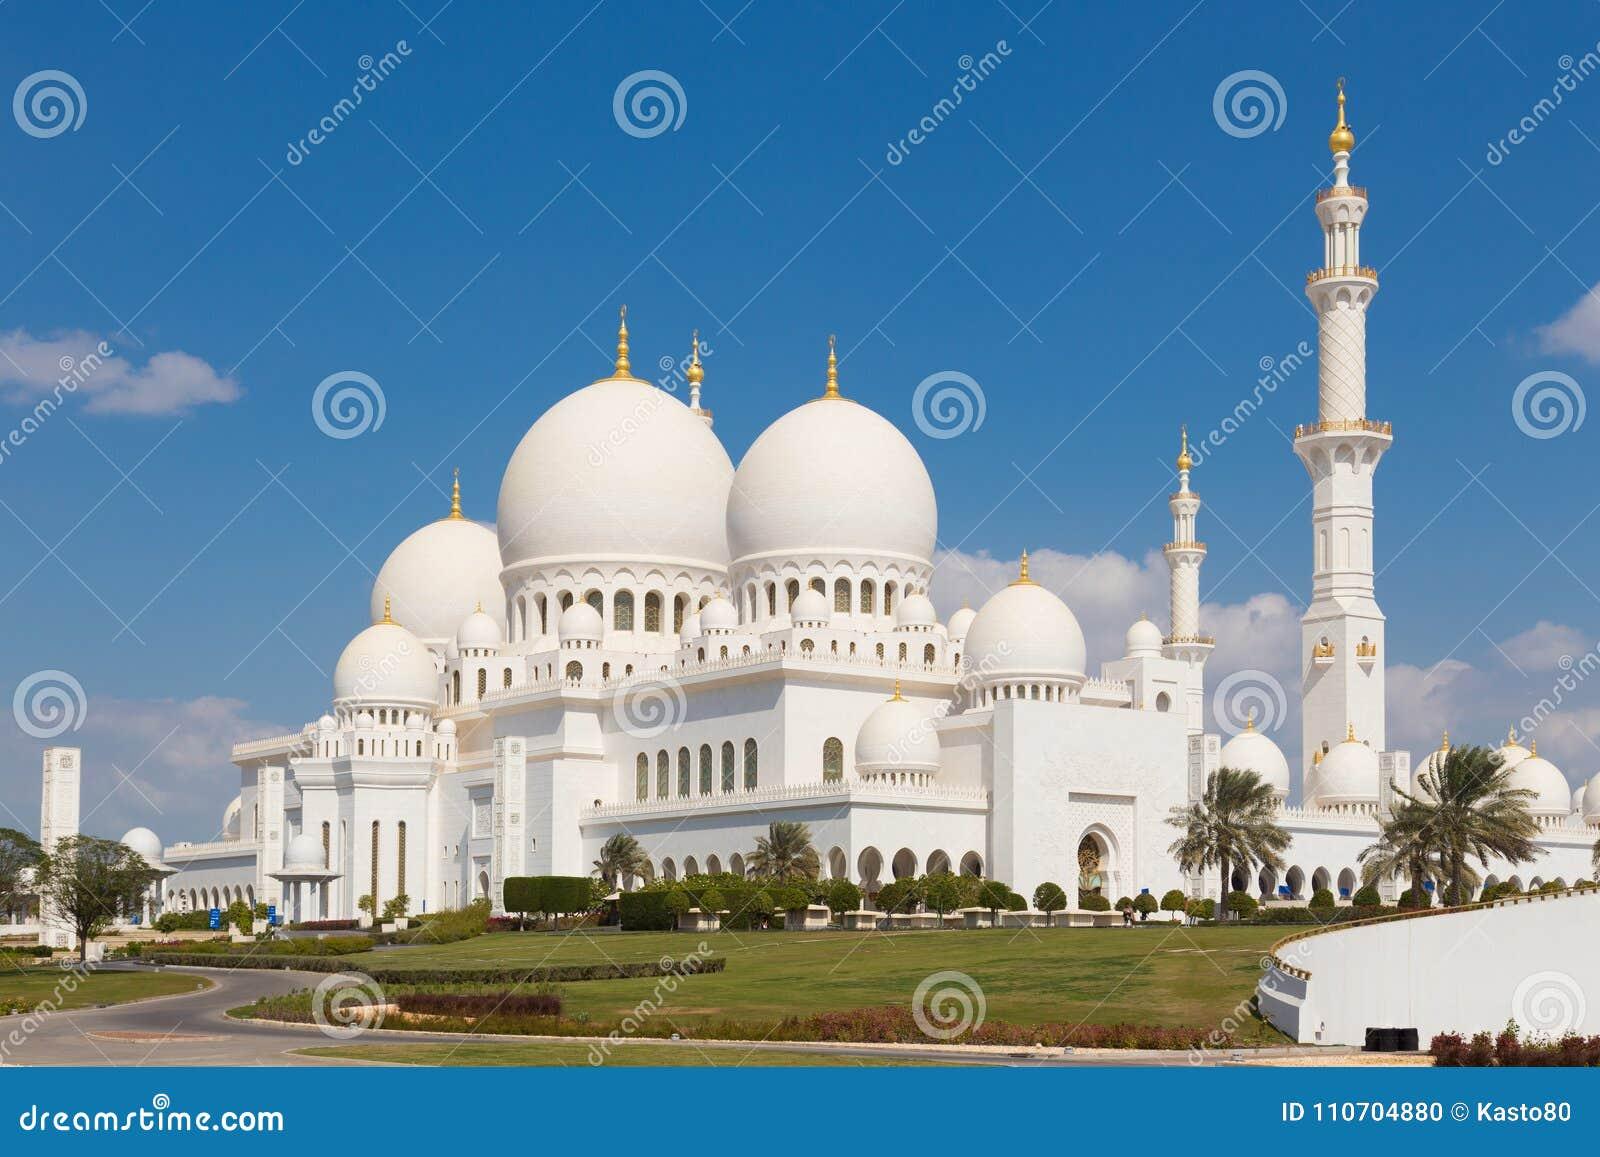 Sheikh Zayed Grand Mosque, Abu Dhabi, Emirats Arabes Unis